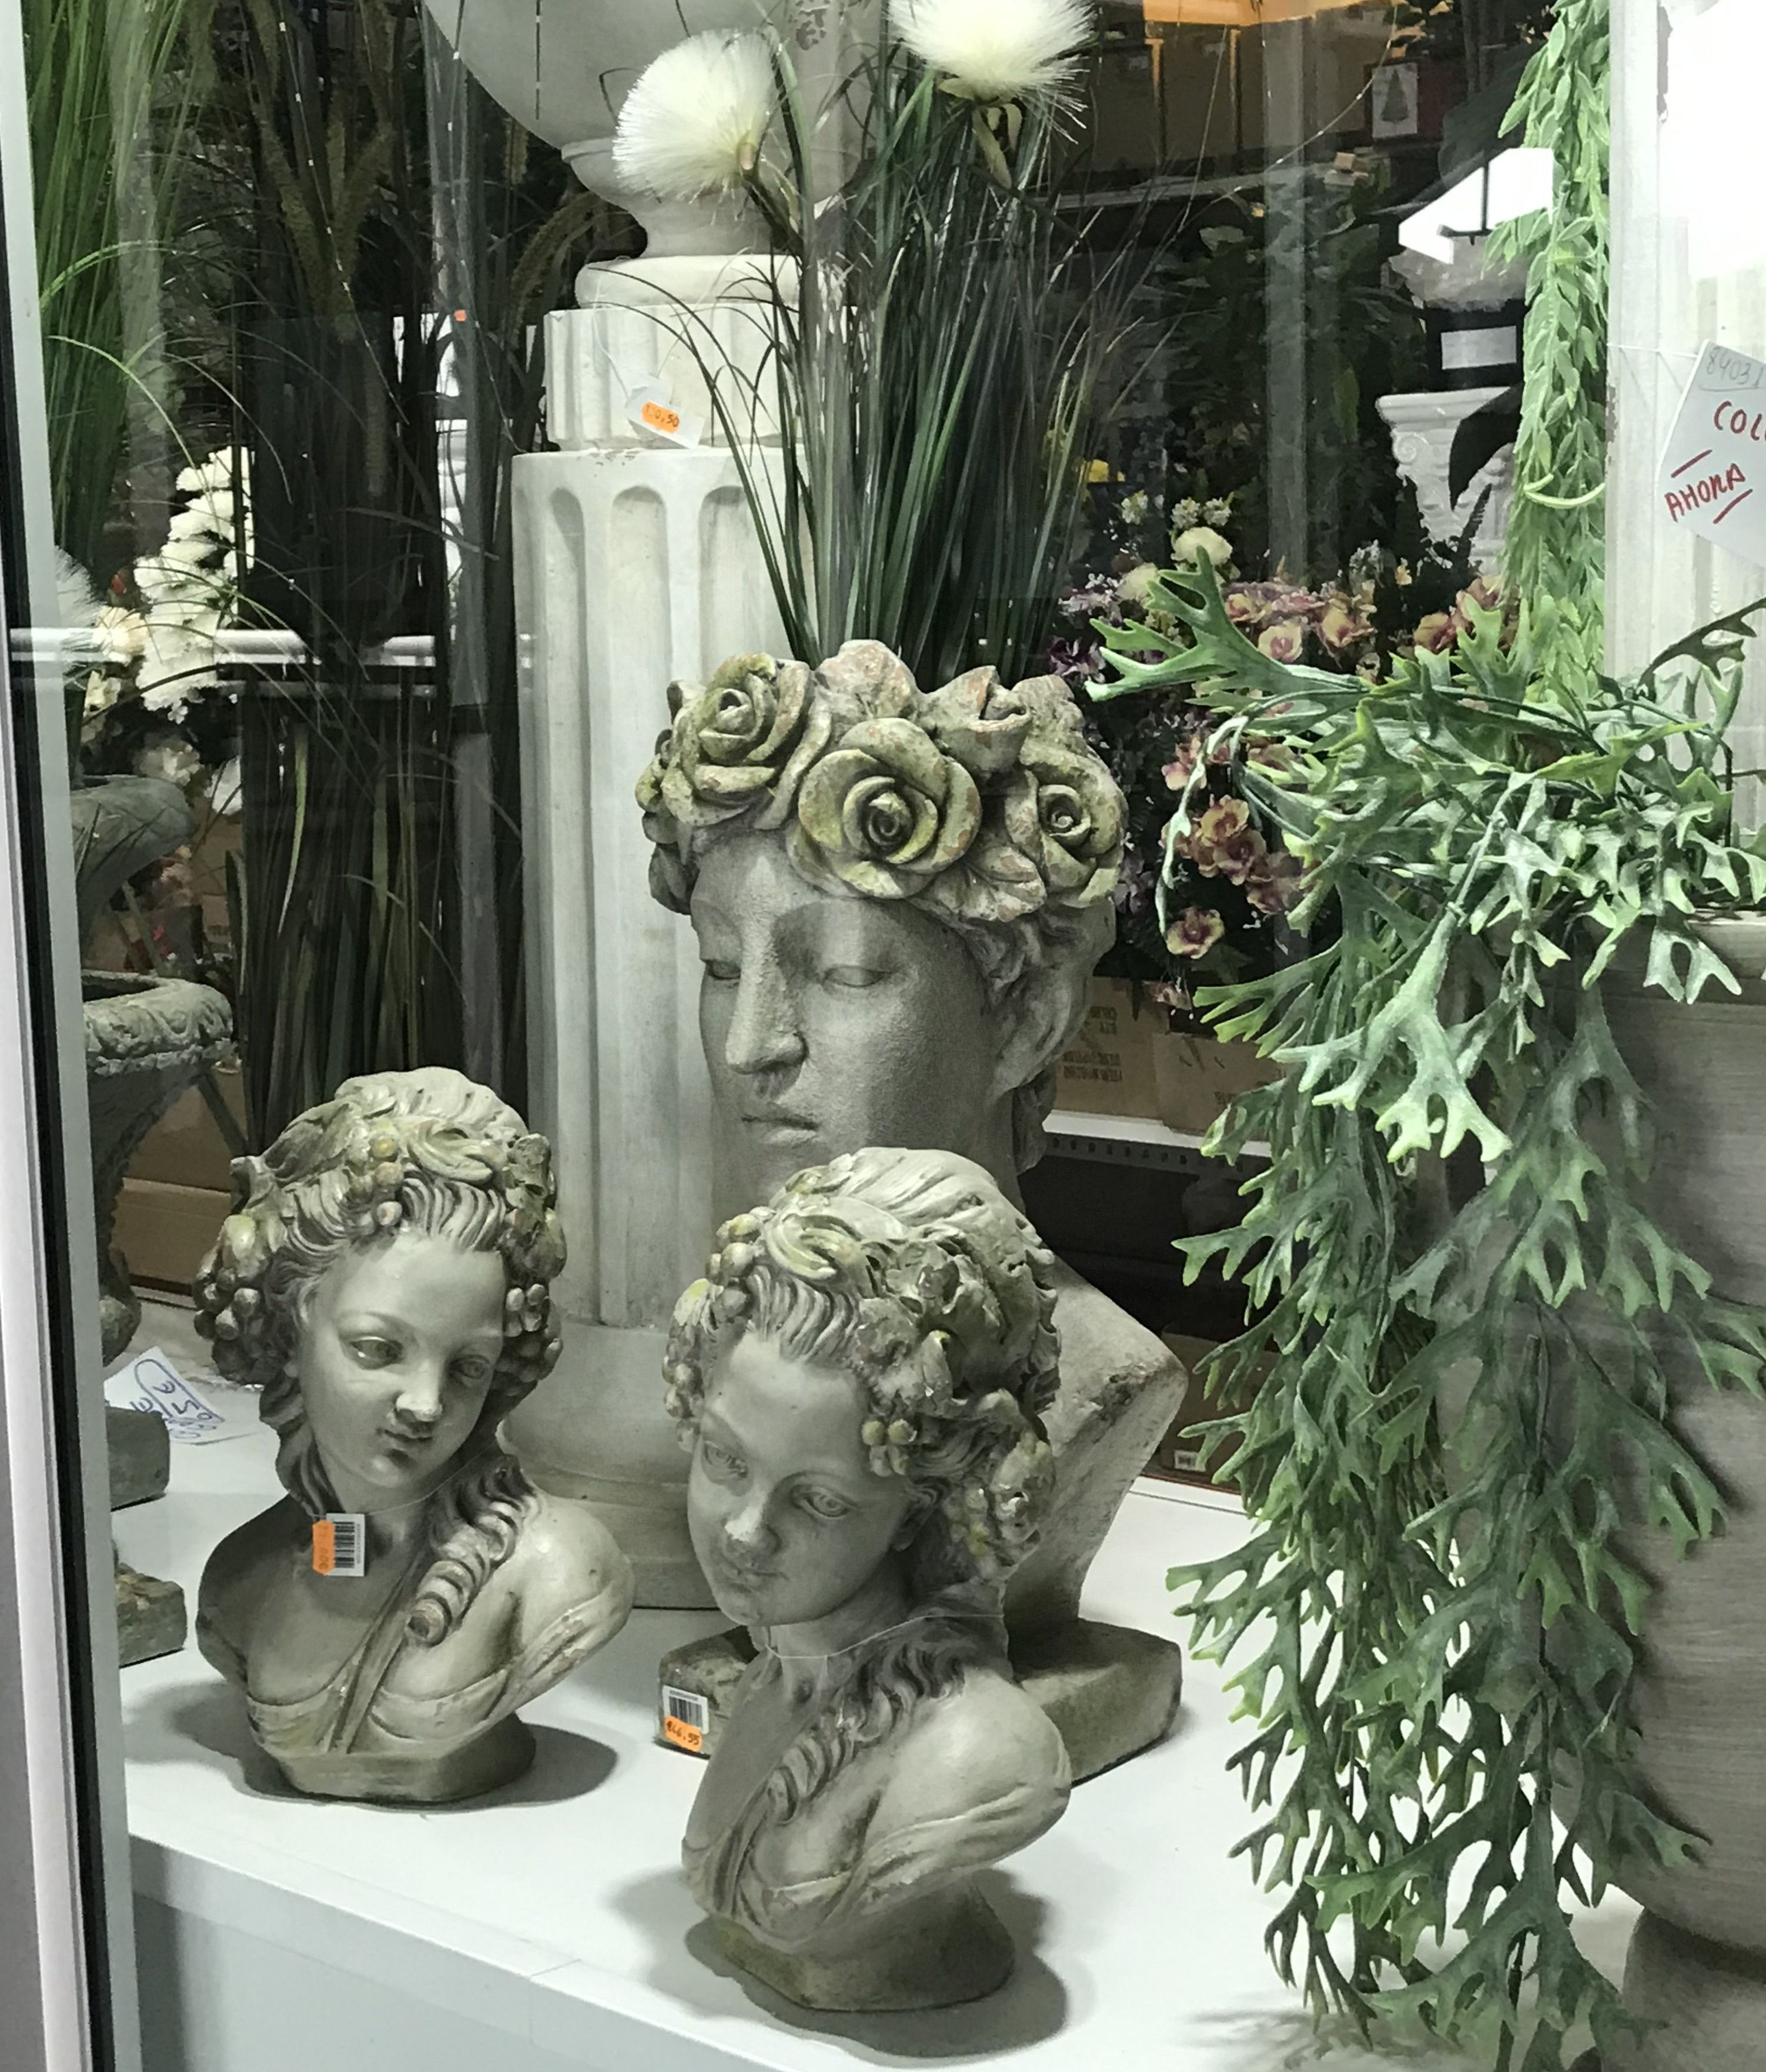 Parada de Merca Flor en Sant Boi de Llobregat- Amplia gama en complementos para floristeria y decoración